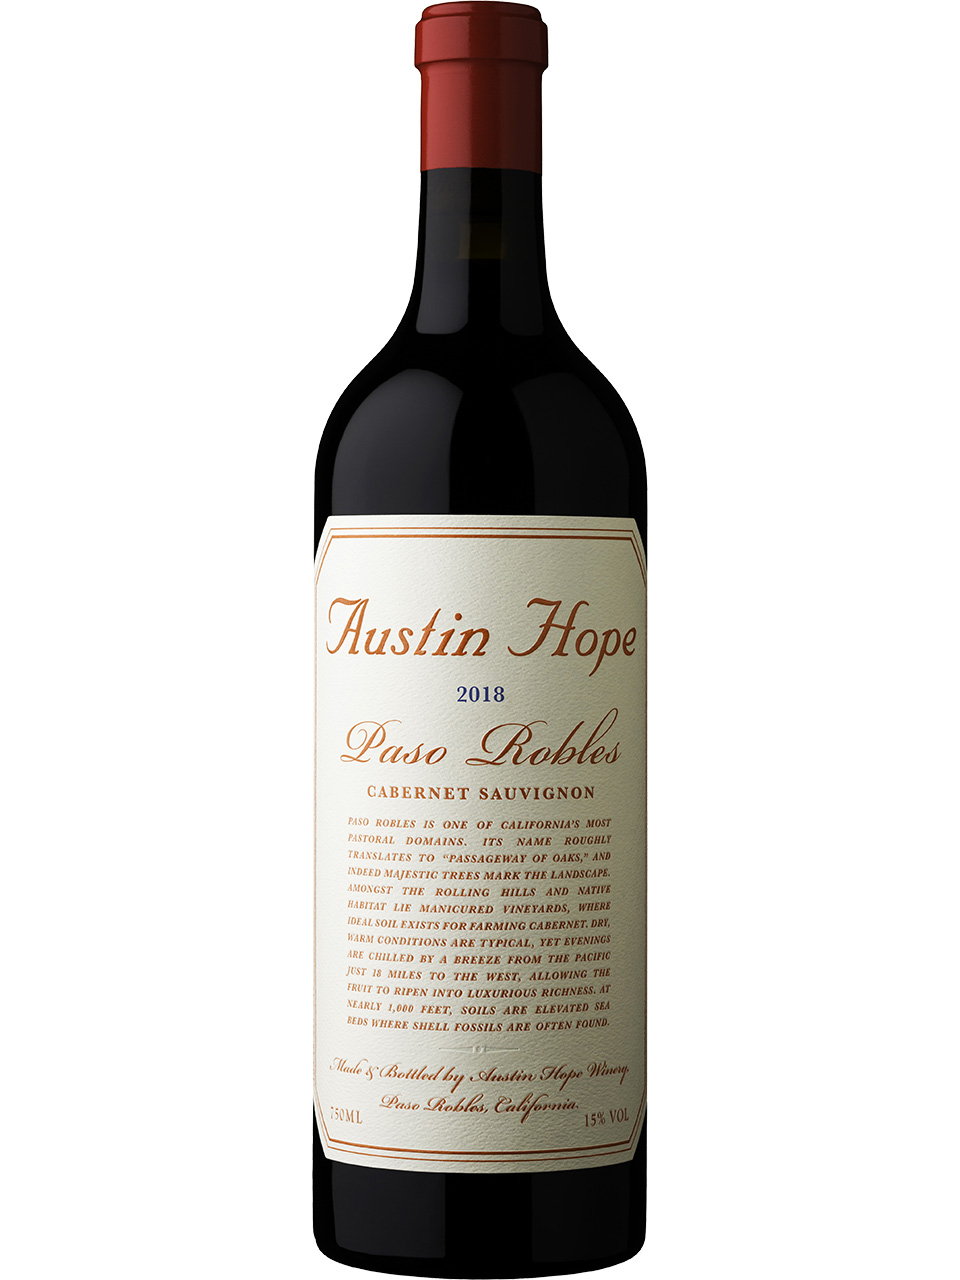 Austin Hope Cabernet Sauvignon